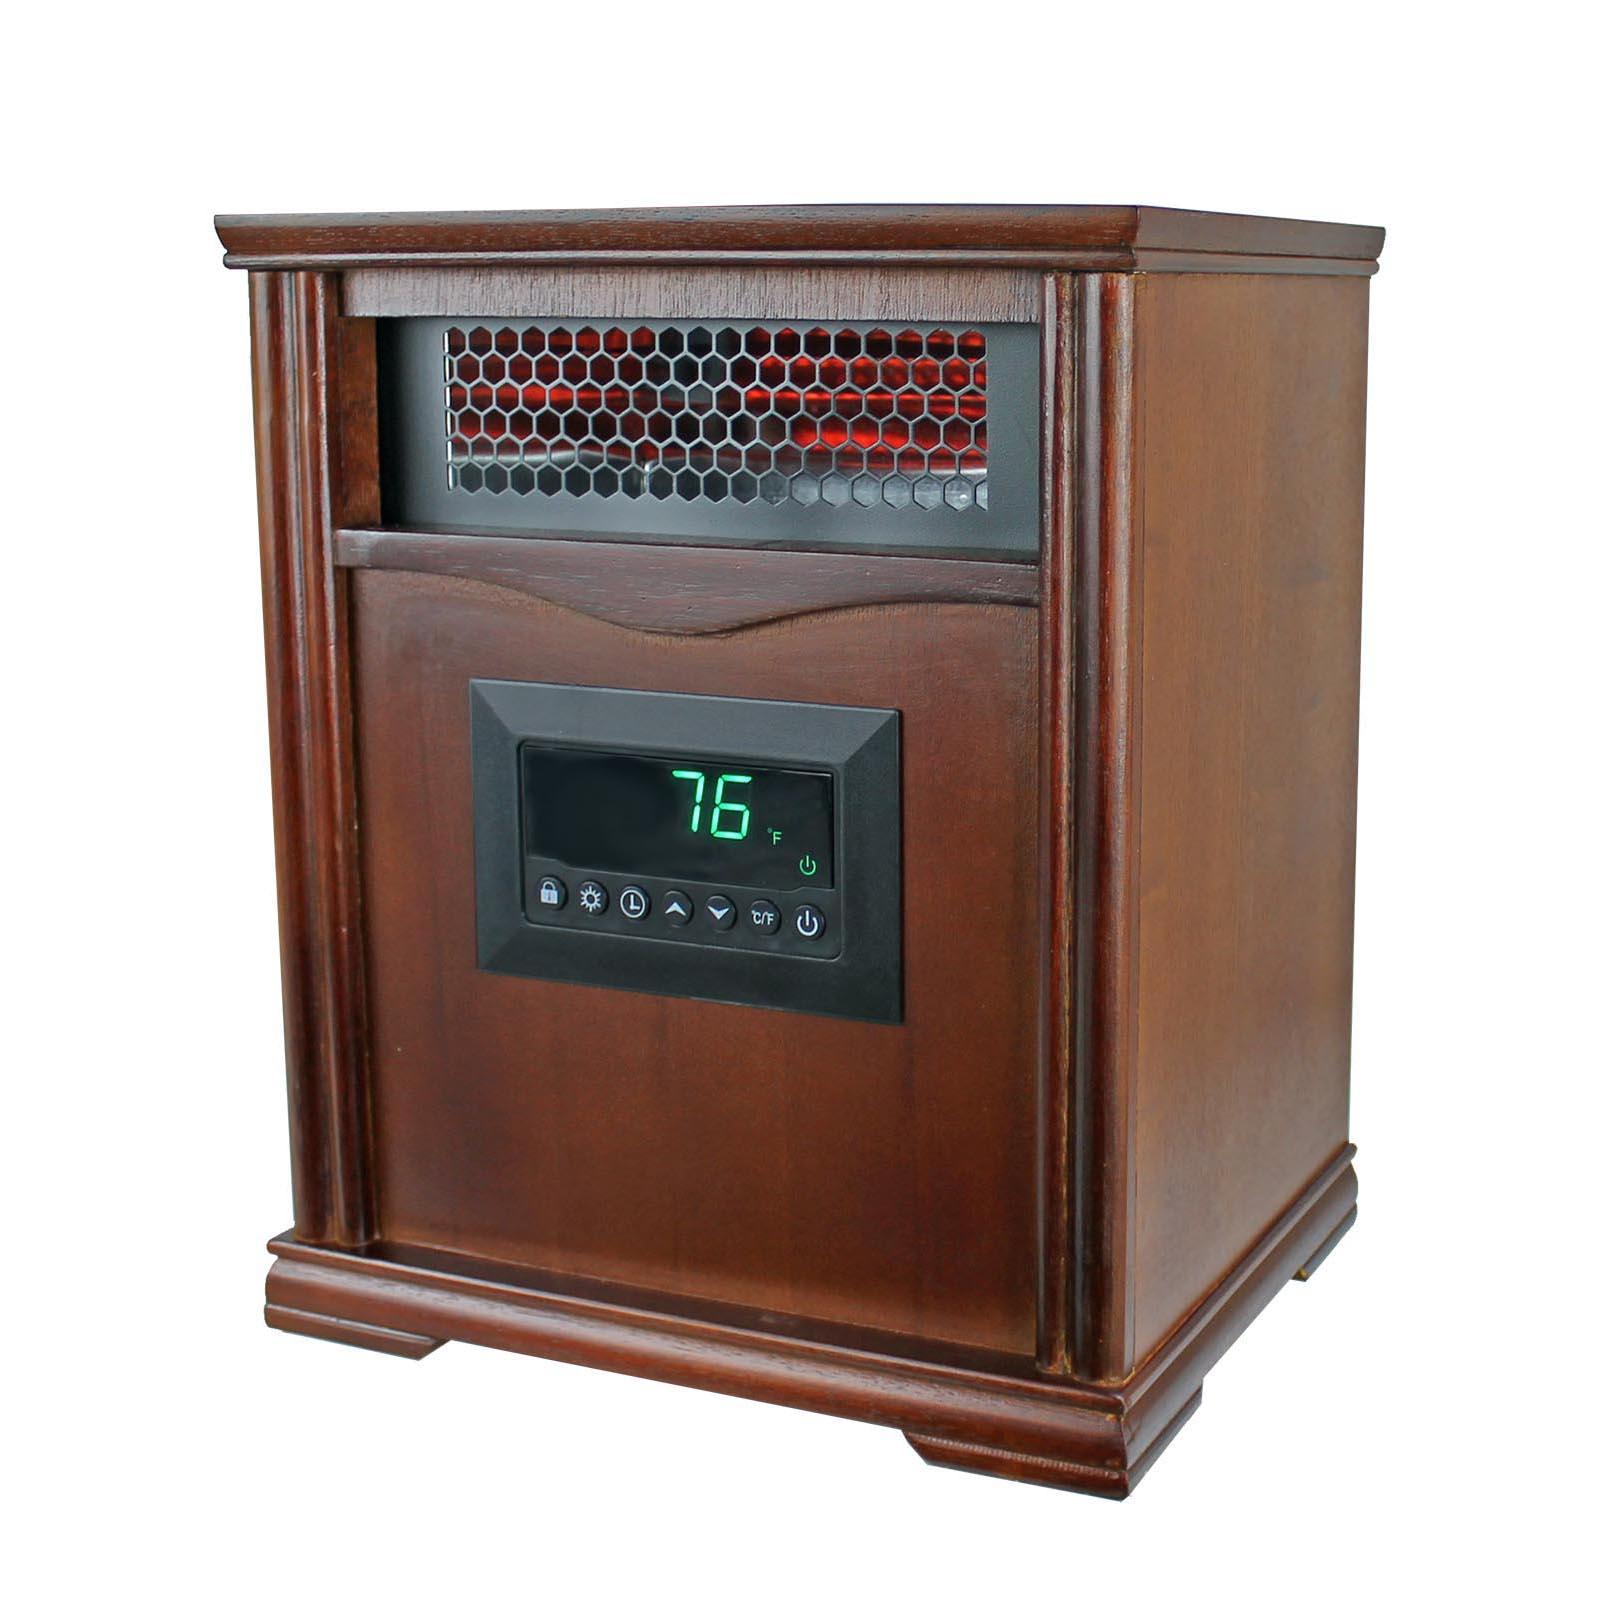 hight resolution of lifesmart lifepro dark oak 1500 watt infrared electric portable space heater walmart com